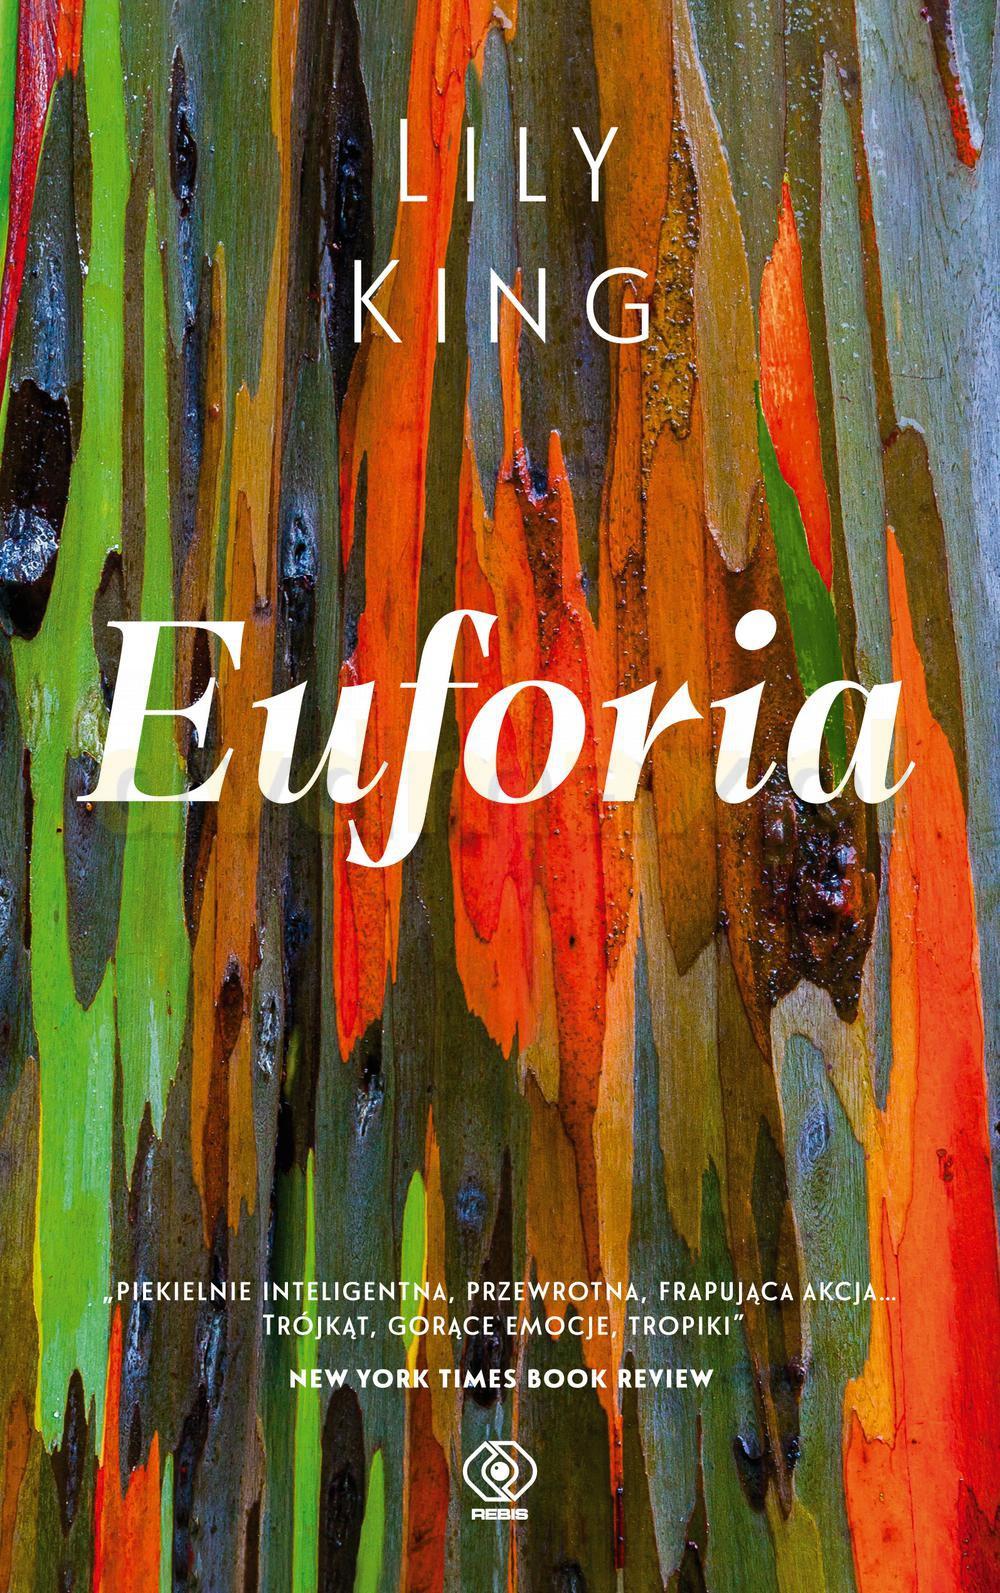 Euforia - Lily King [KSIĄŻKA] - Lily King